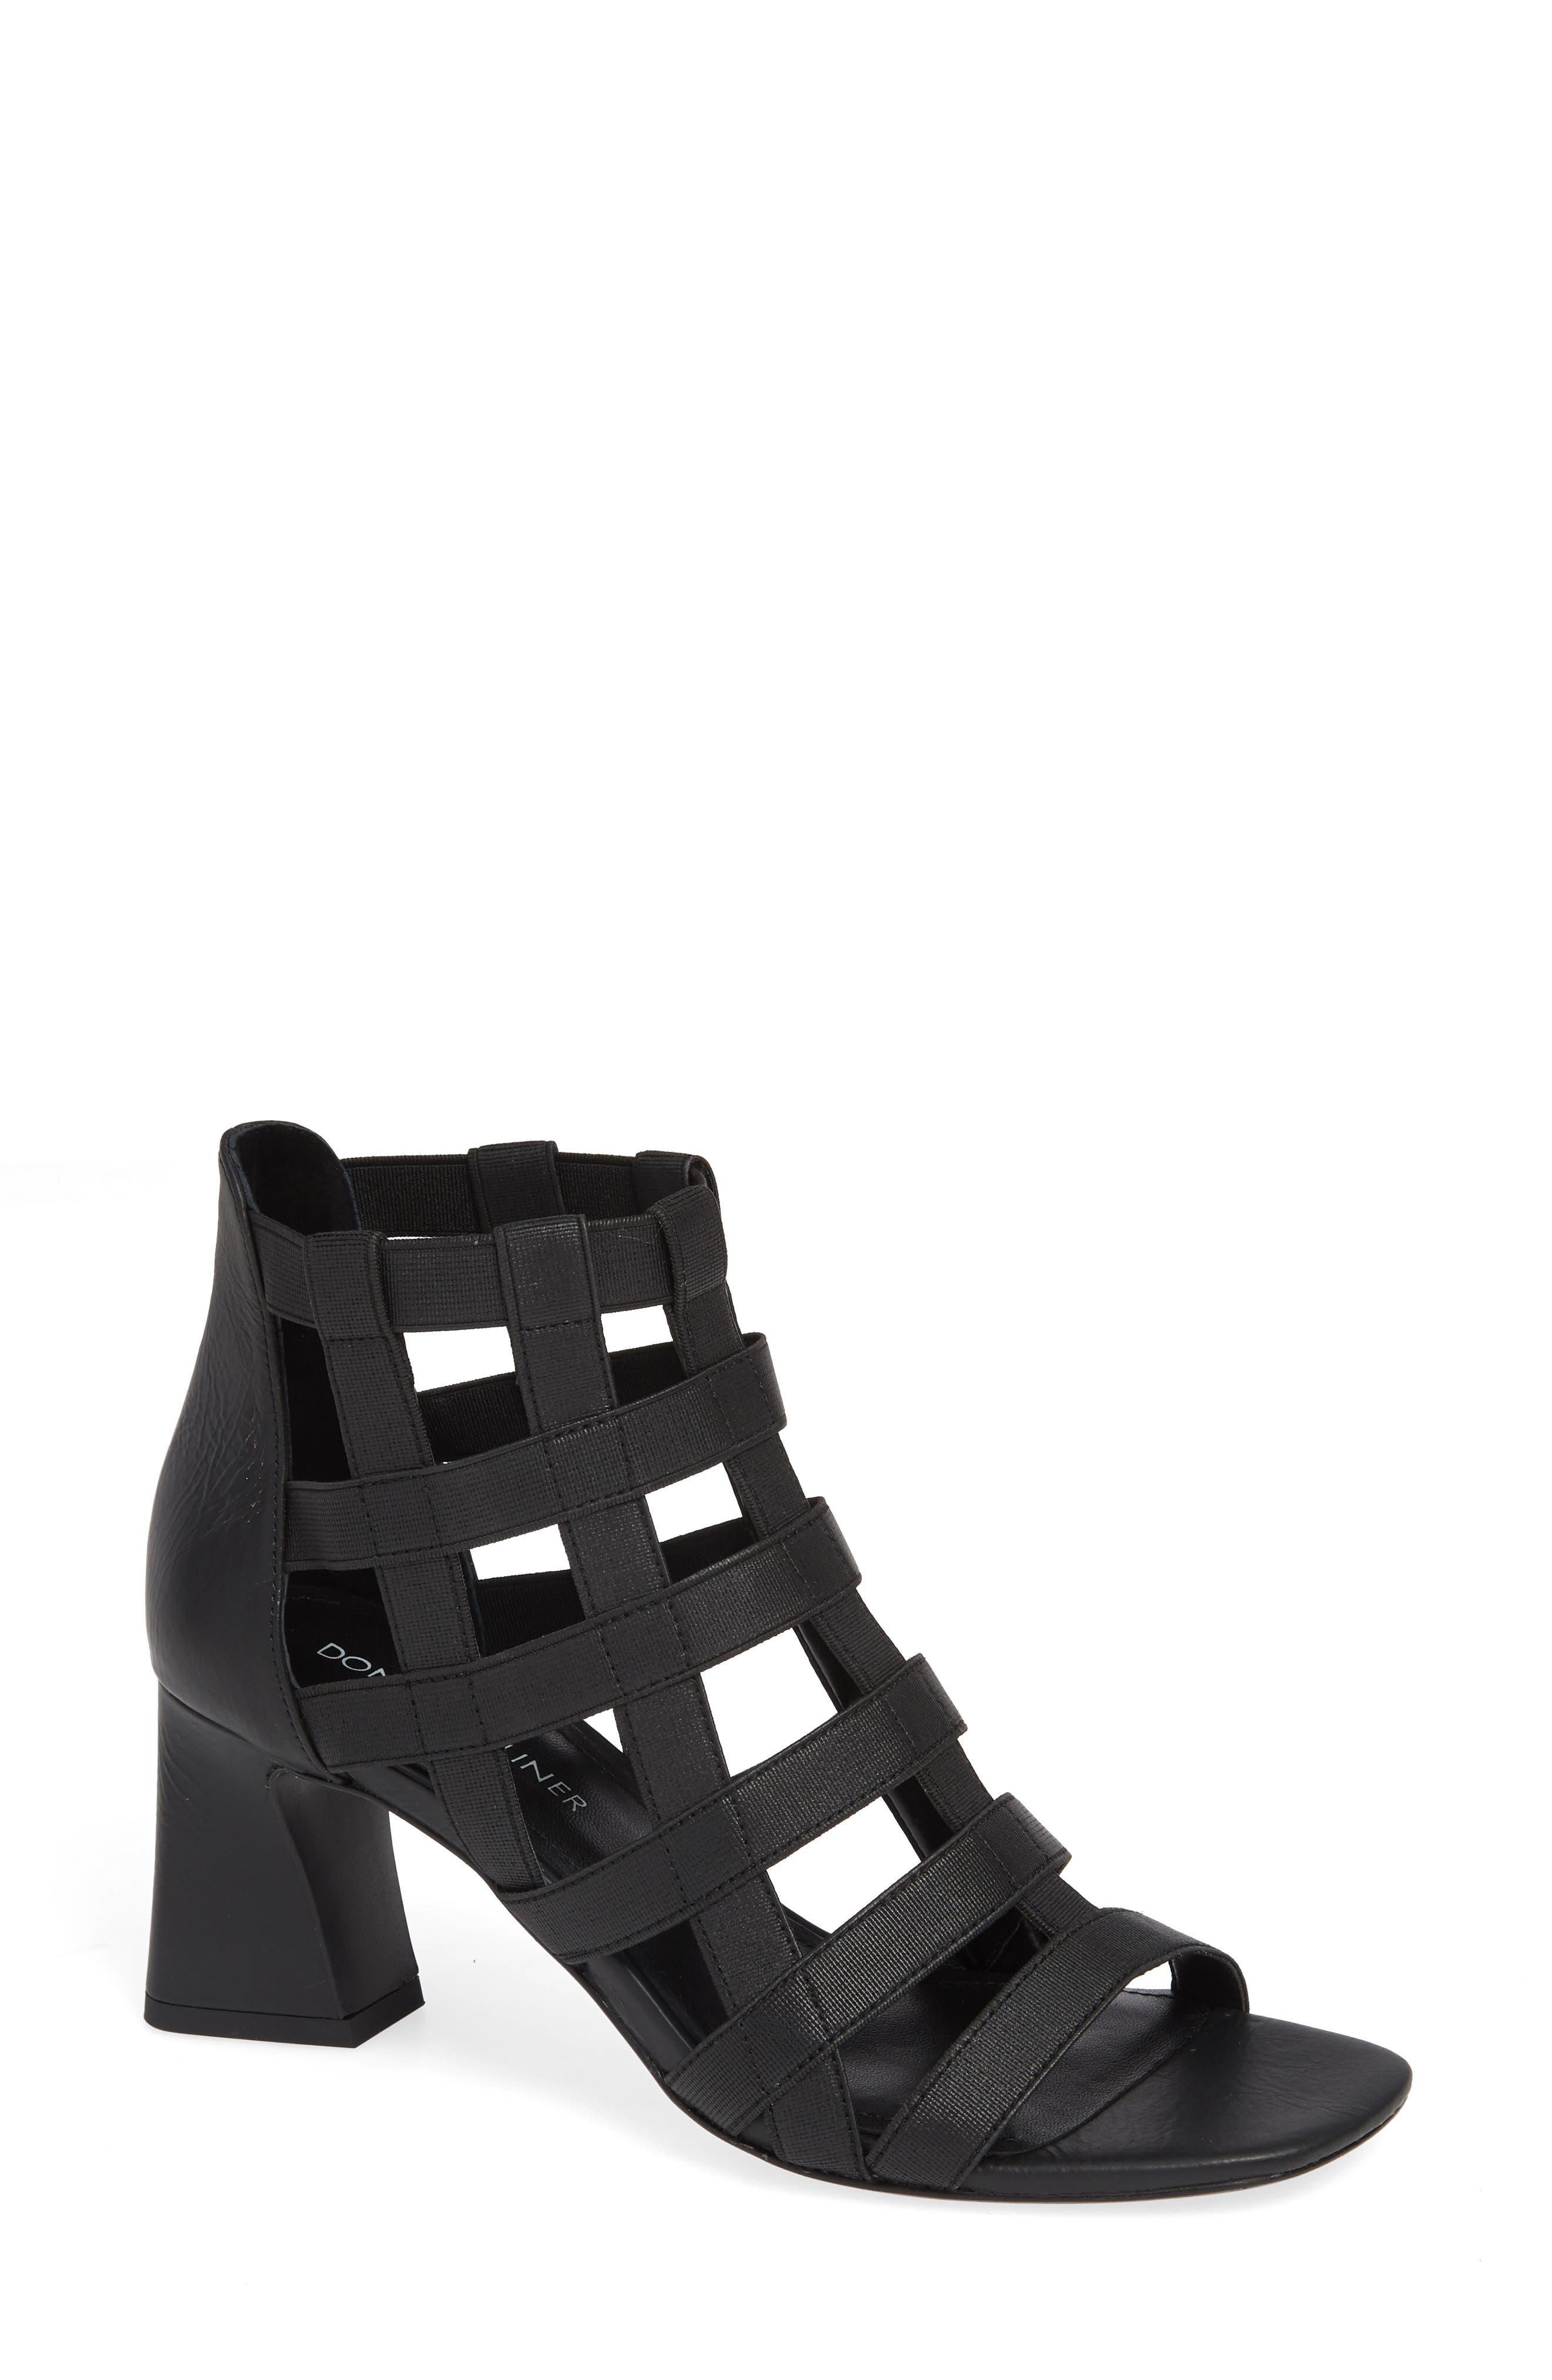 DONALD PLINER Women'S Visto Strappy Cage Block Heel Sandals in Black